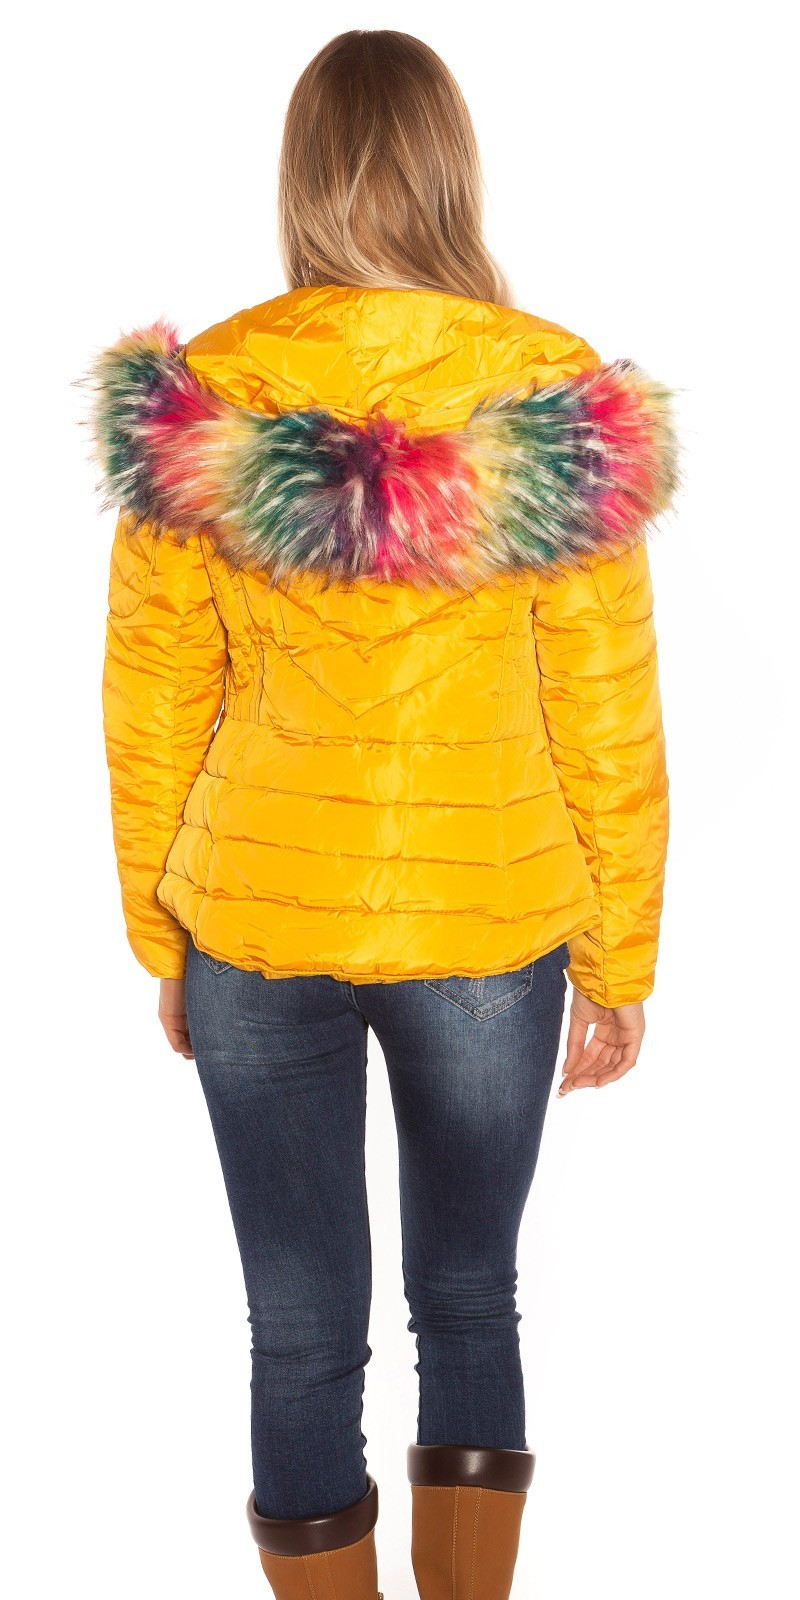 Zimná bunda s farebnou kožušinou Mustard – Sissy Boutique 4df0f3f68ea